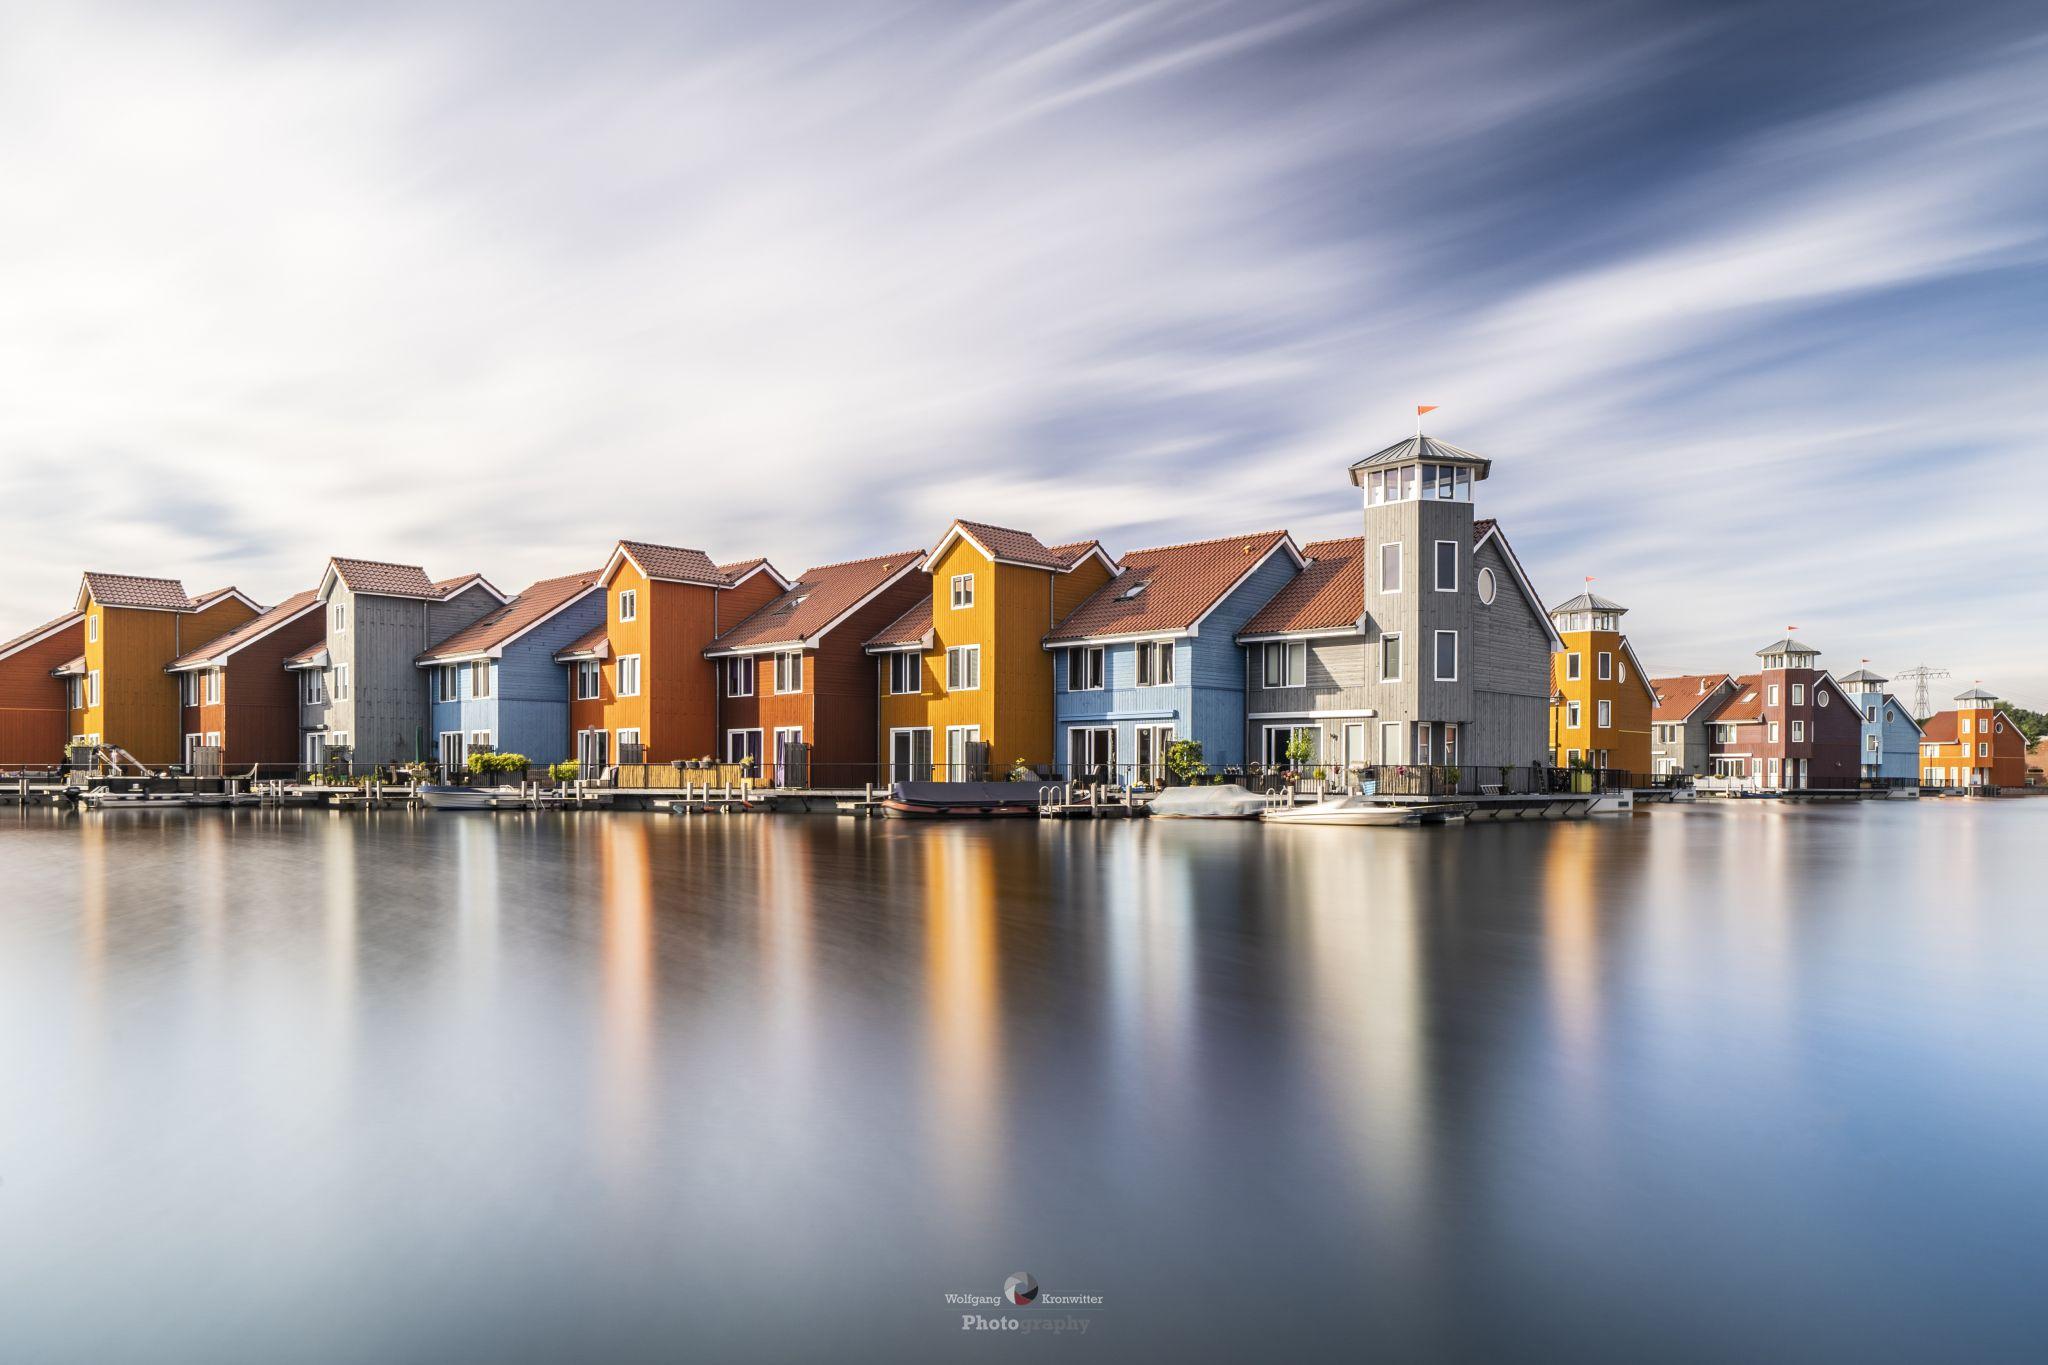 Reitdiephavn, Netherlands